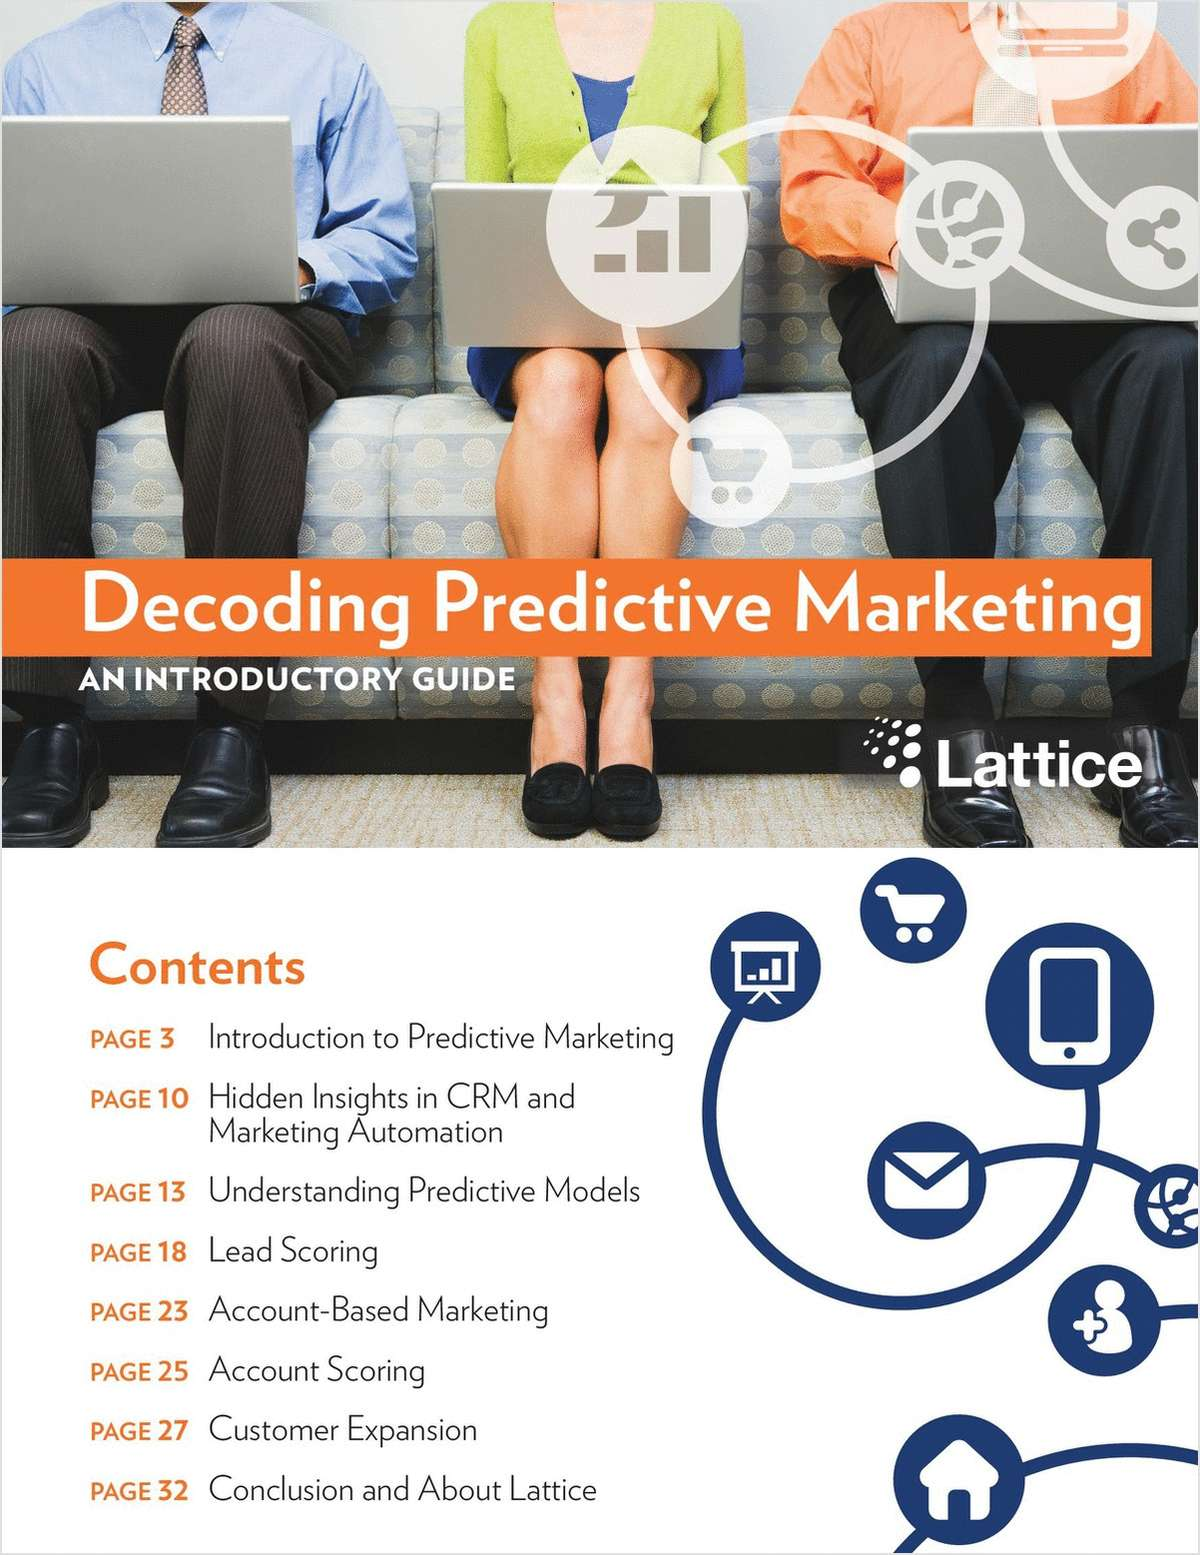 Decoding Predictive Marketing